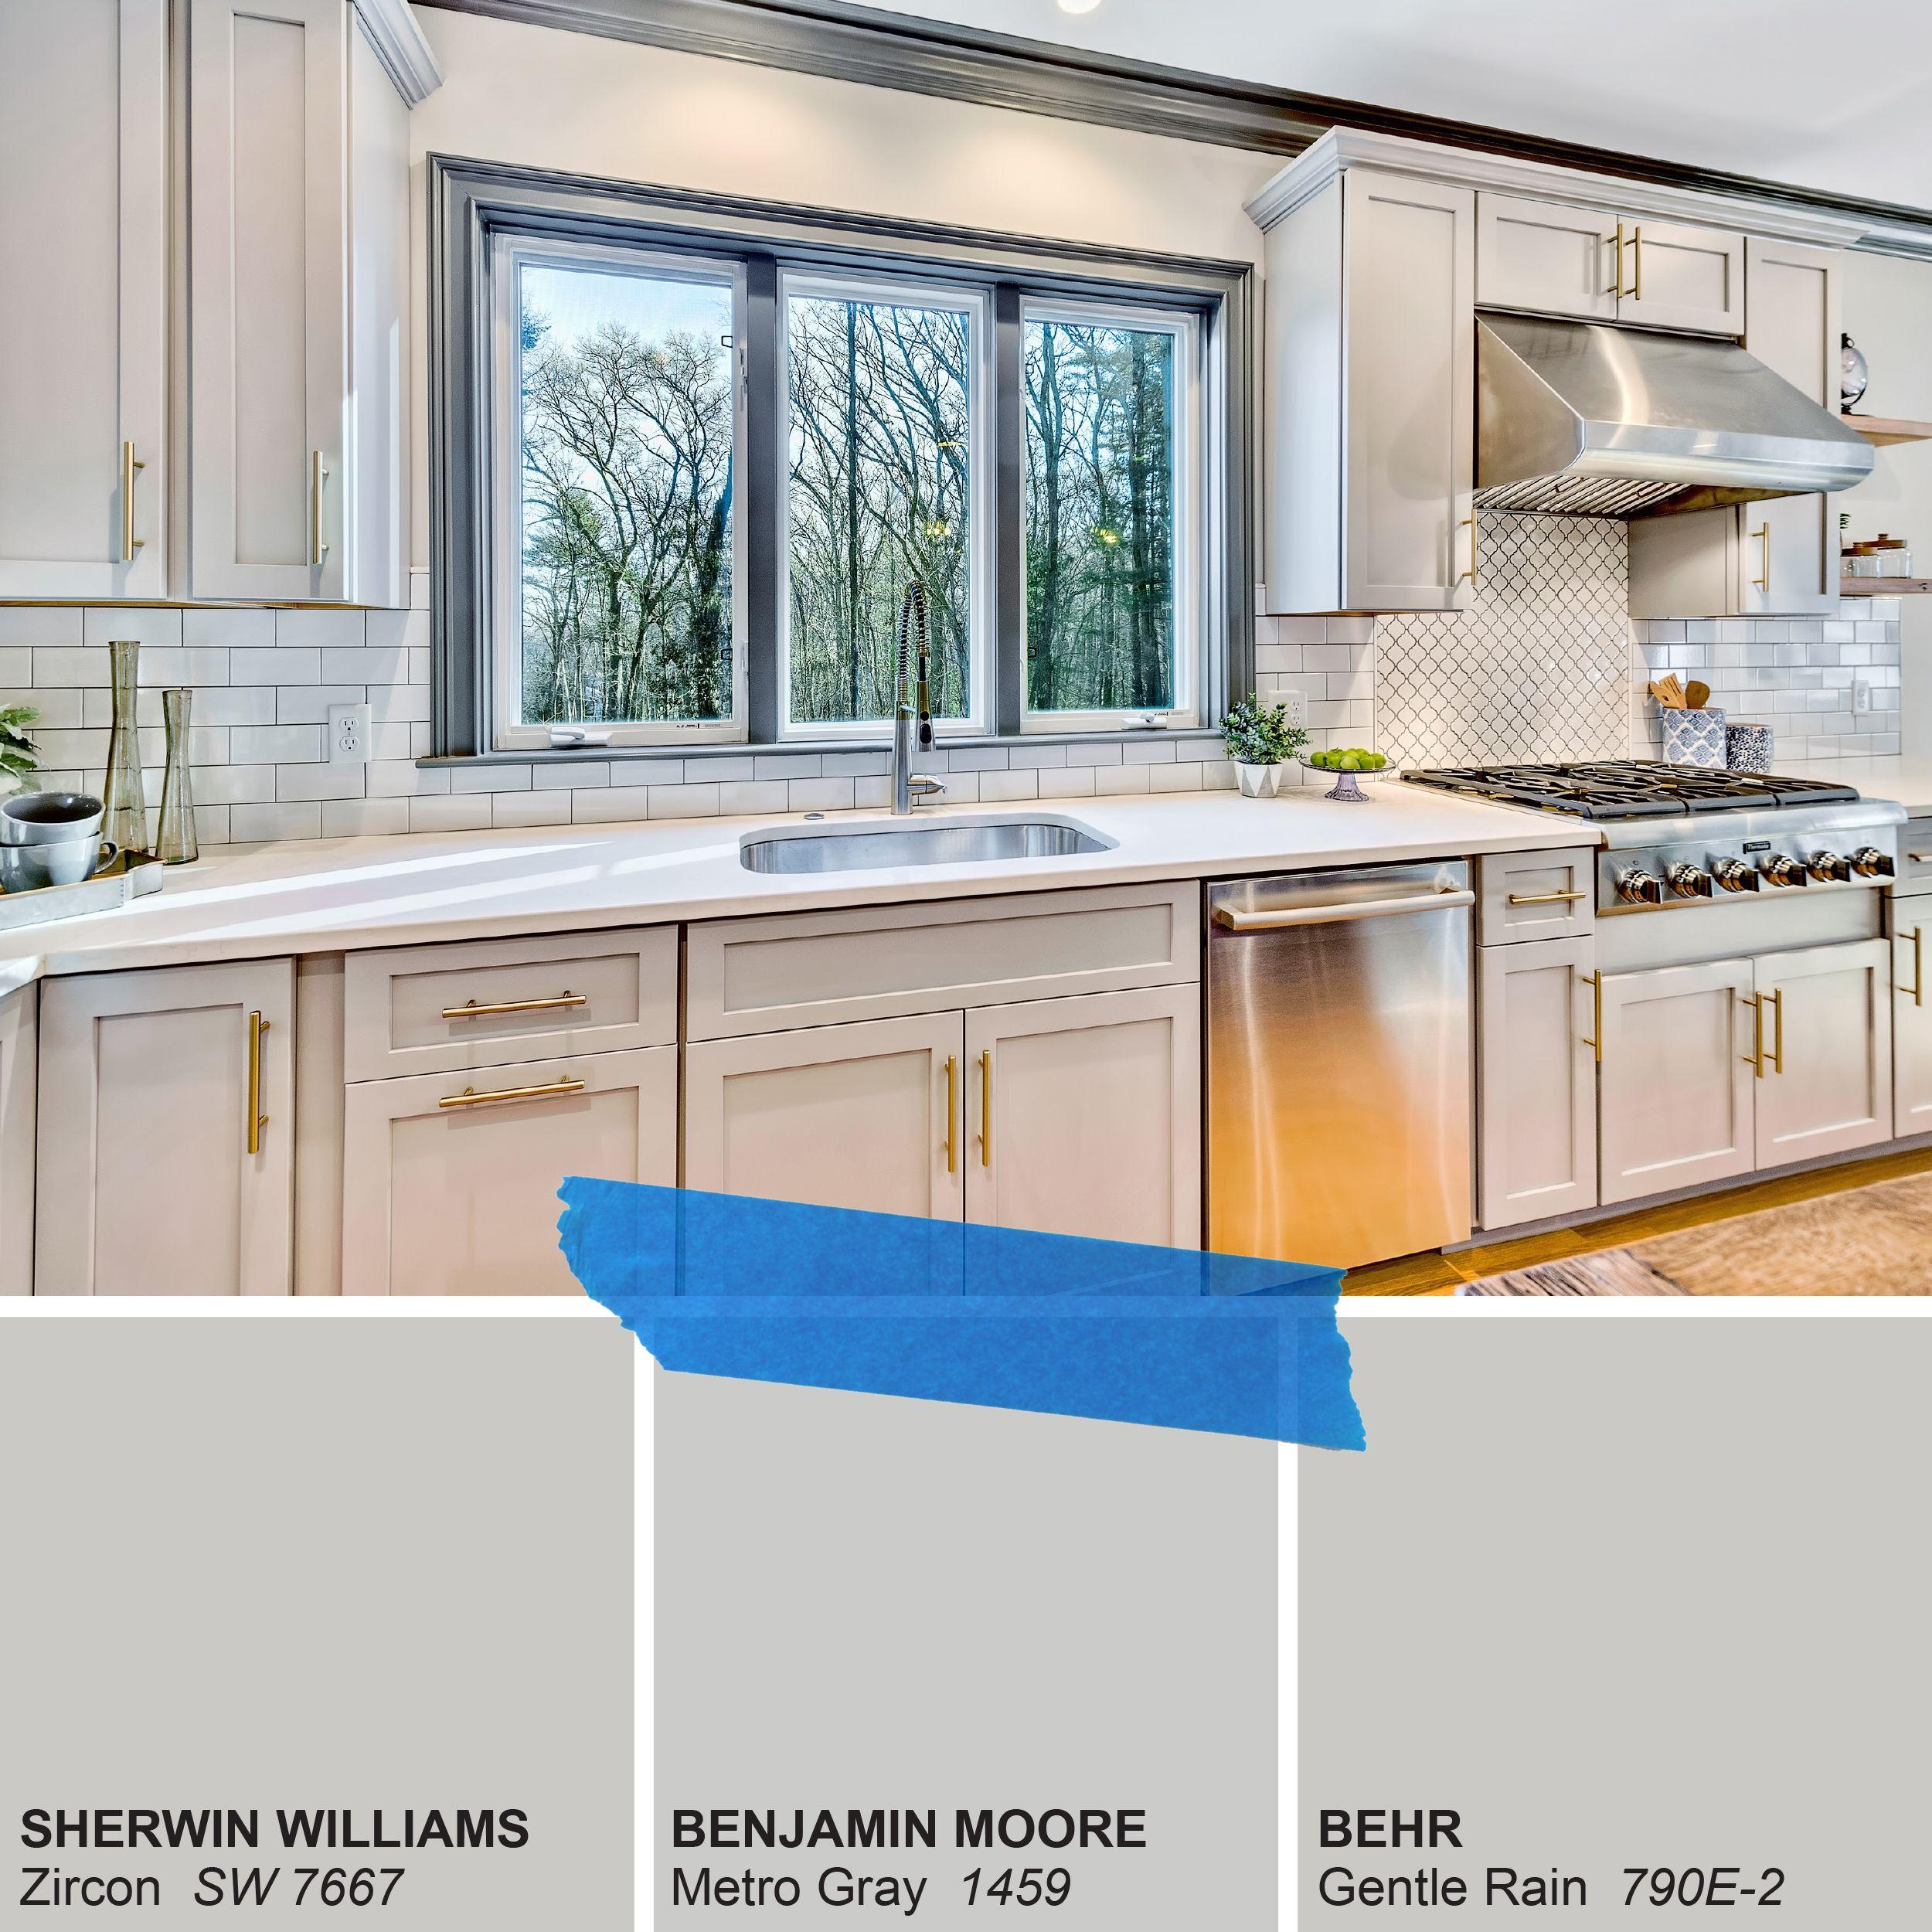 Starmark Cabinets Cabinet Color Kitchen Cabinet Color Frost Sherwin Williams Zircon Zi Kitchen Cabinet Colors White Kitchen Design Green Kitchen Designs